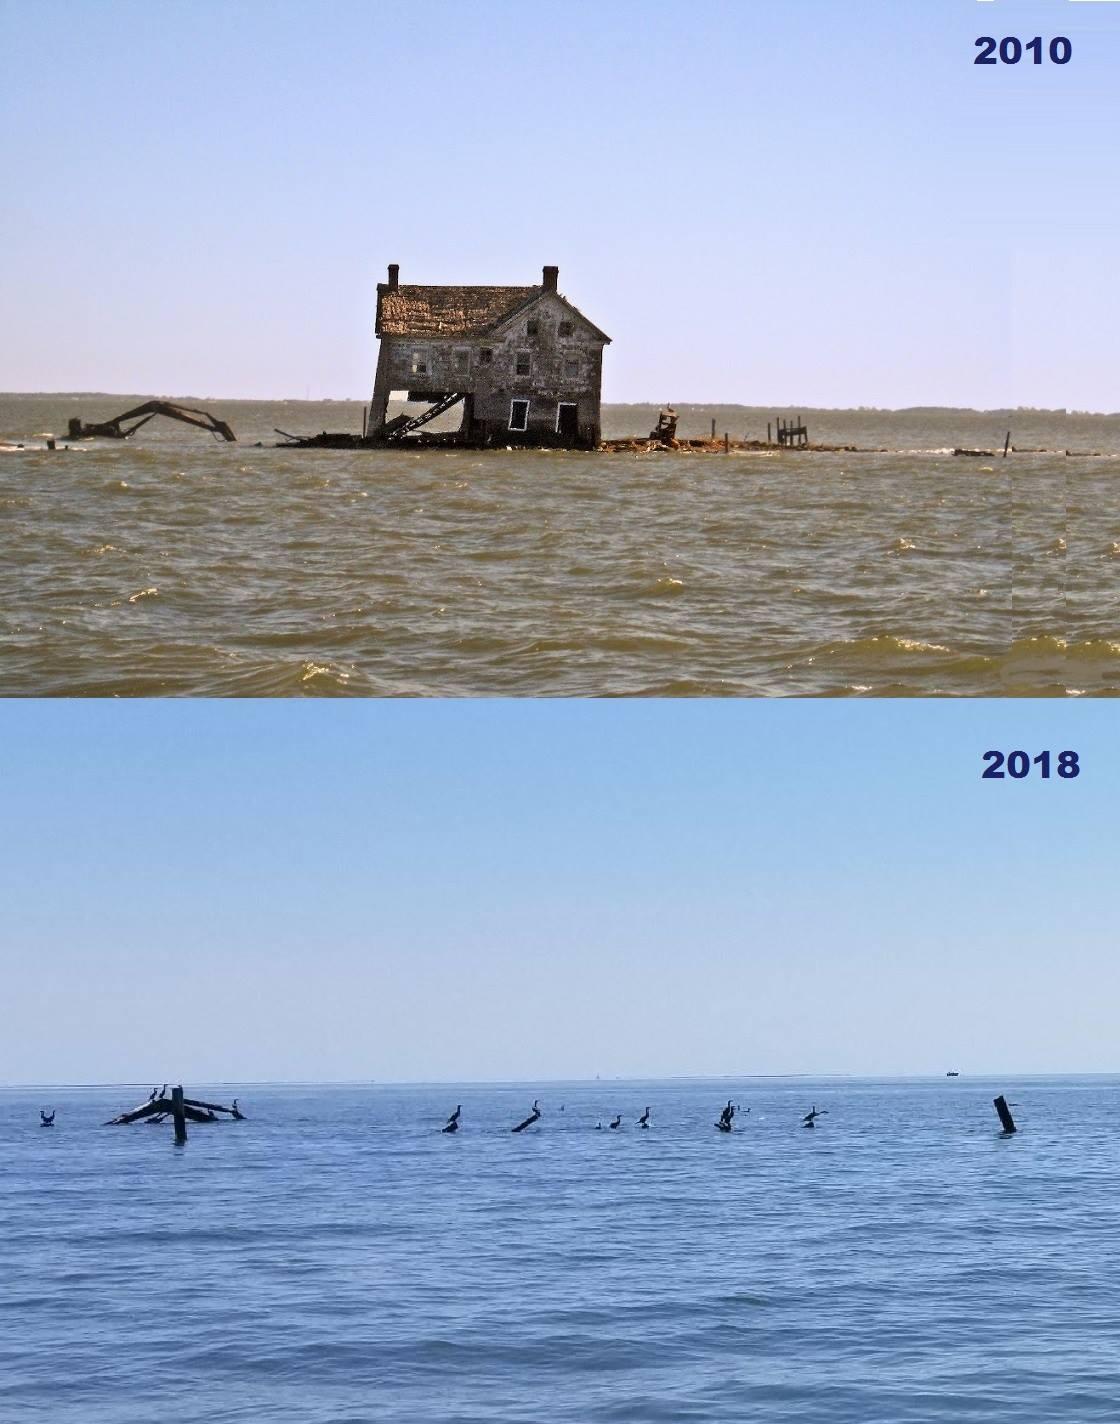 Last house on Holland Island 2010 vs. 2018  Image courtesy David Pietroski.